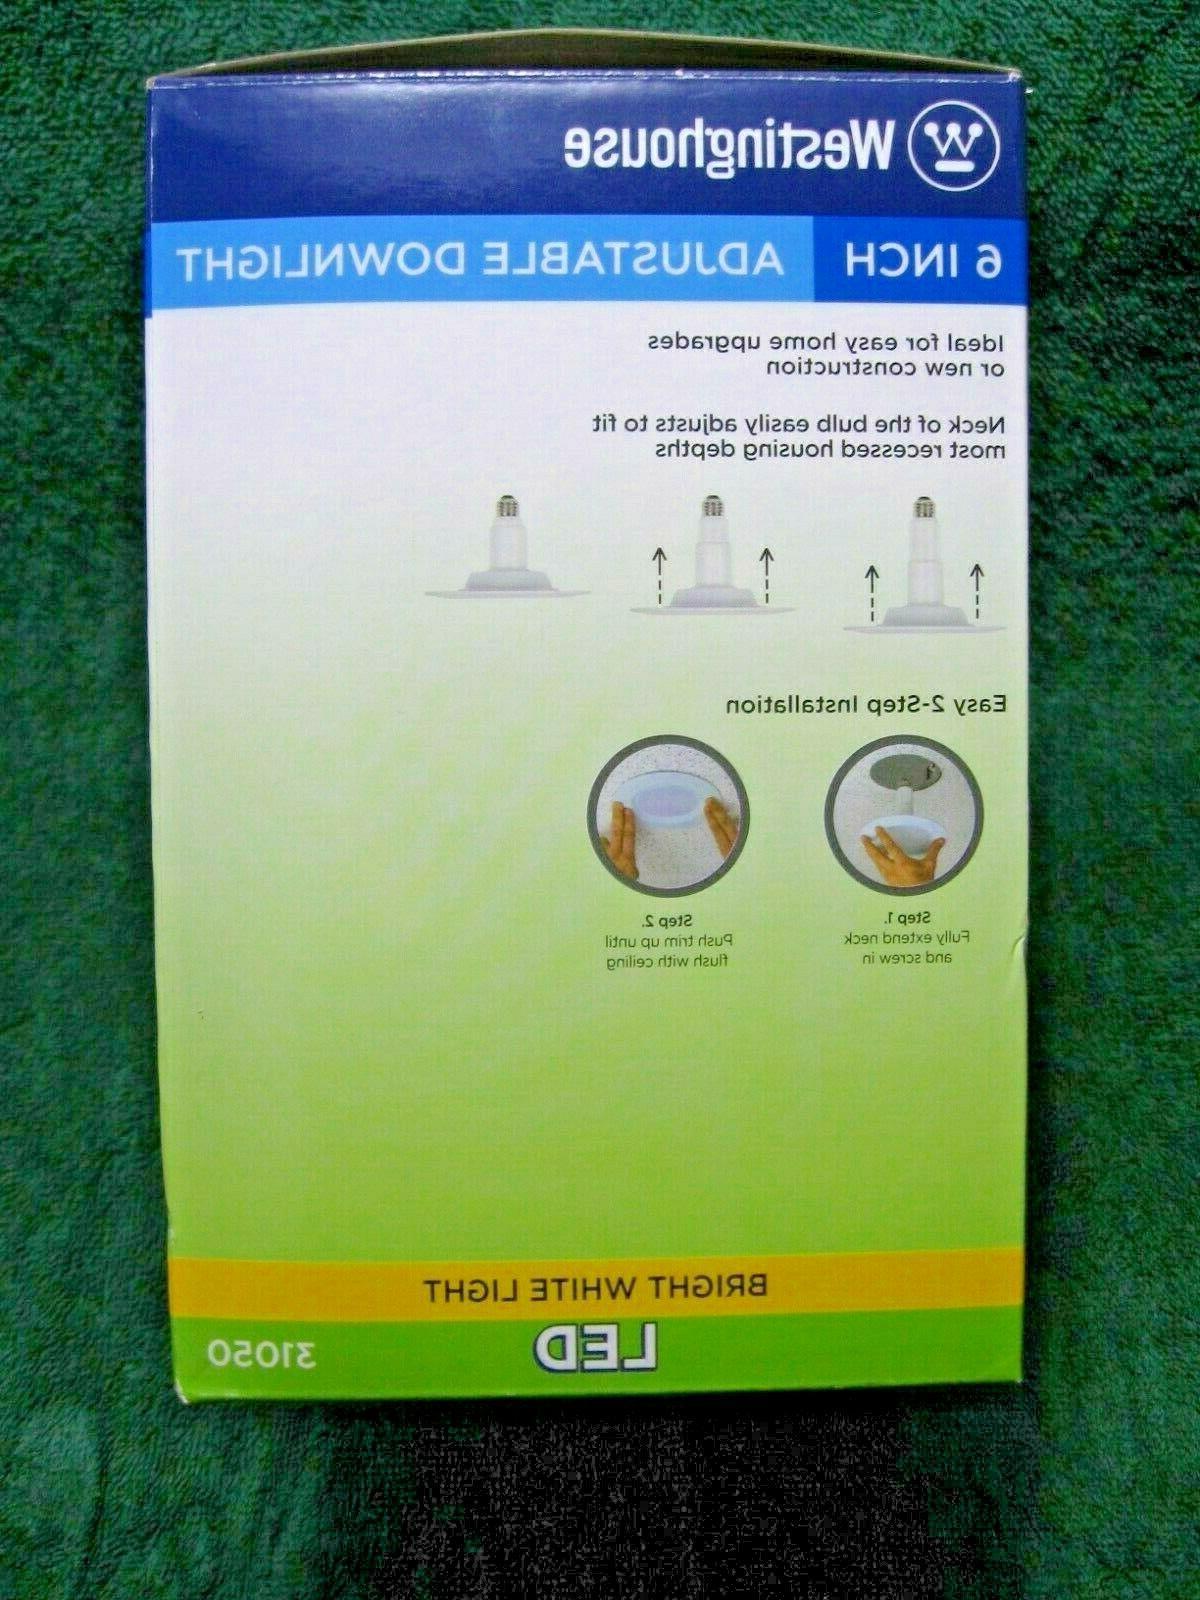 WESTINGHOUSE 75 Watt Equivalent Adjustable Downlight